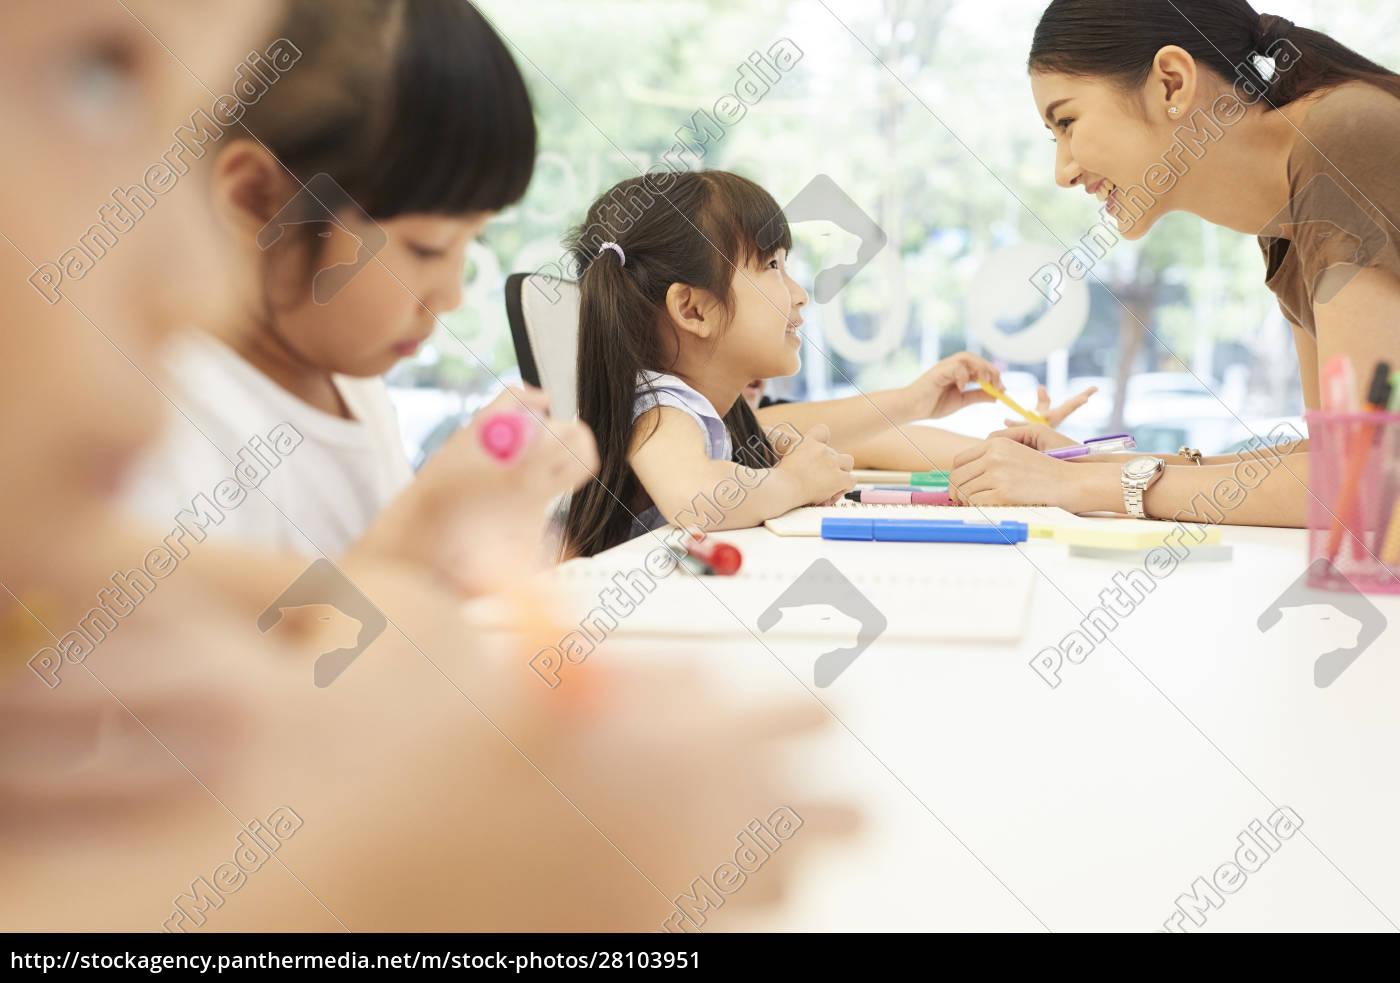 schoolchild, school, life - 28103951